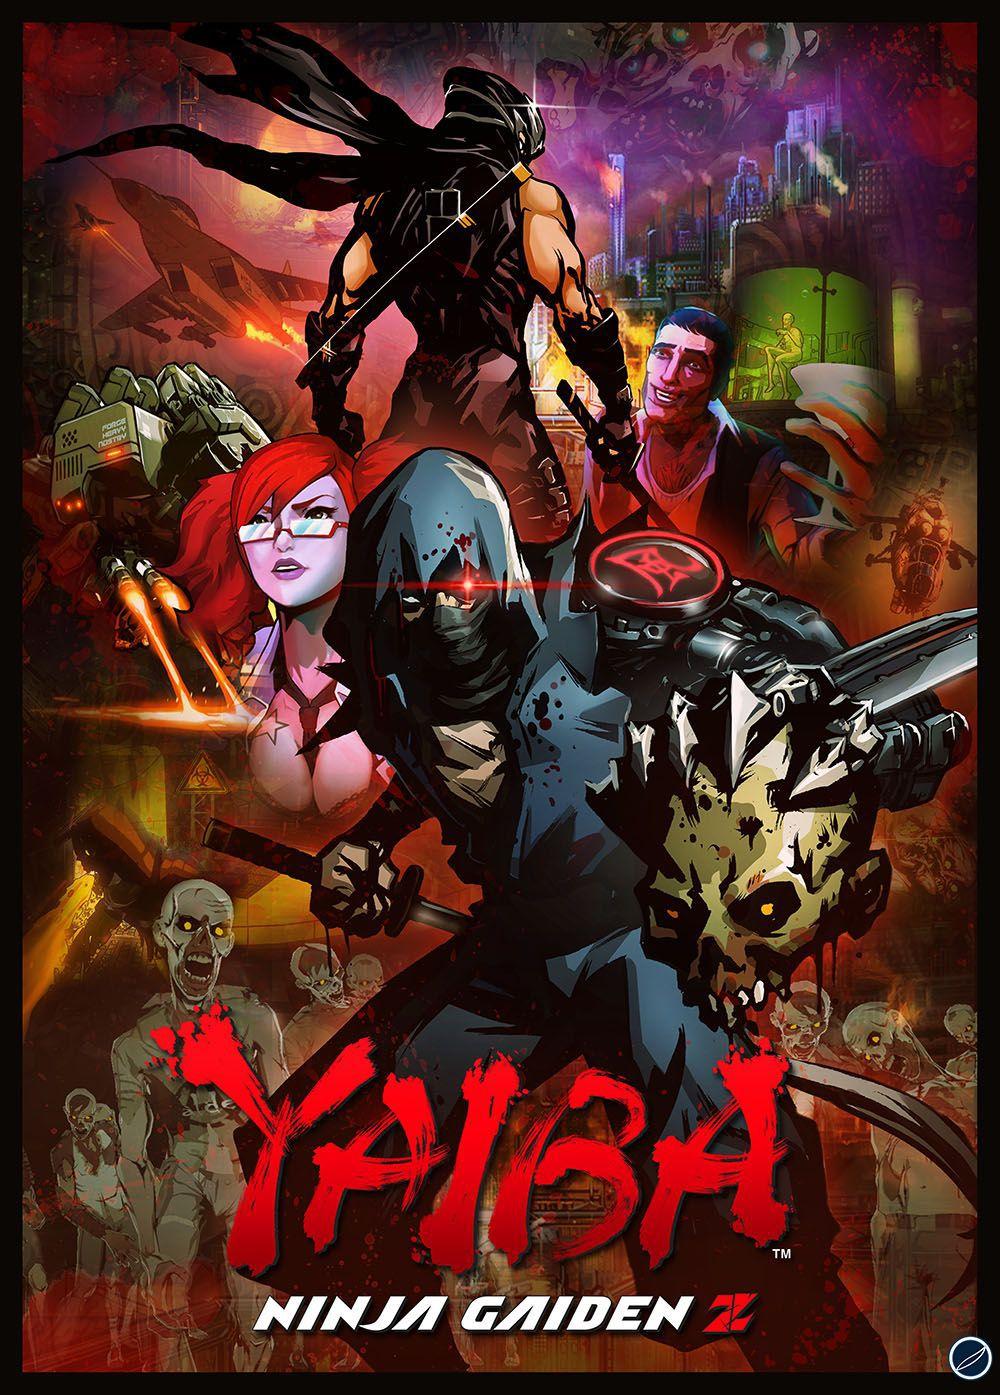 yaiba-ninja-gaiden-z_PS3_w_1302.jpg